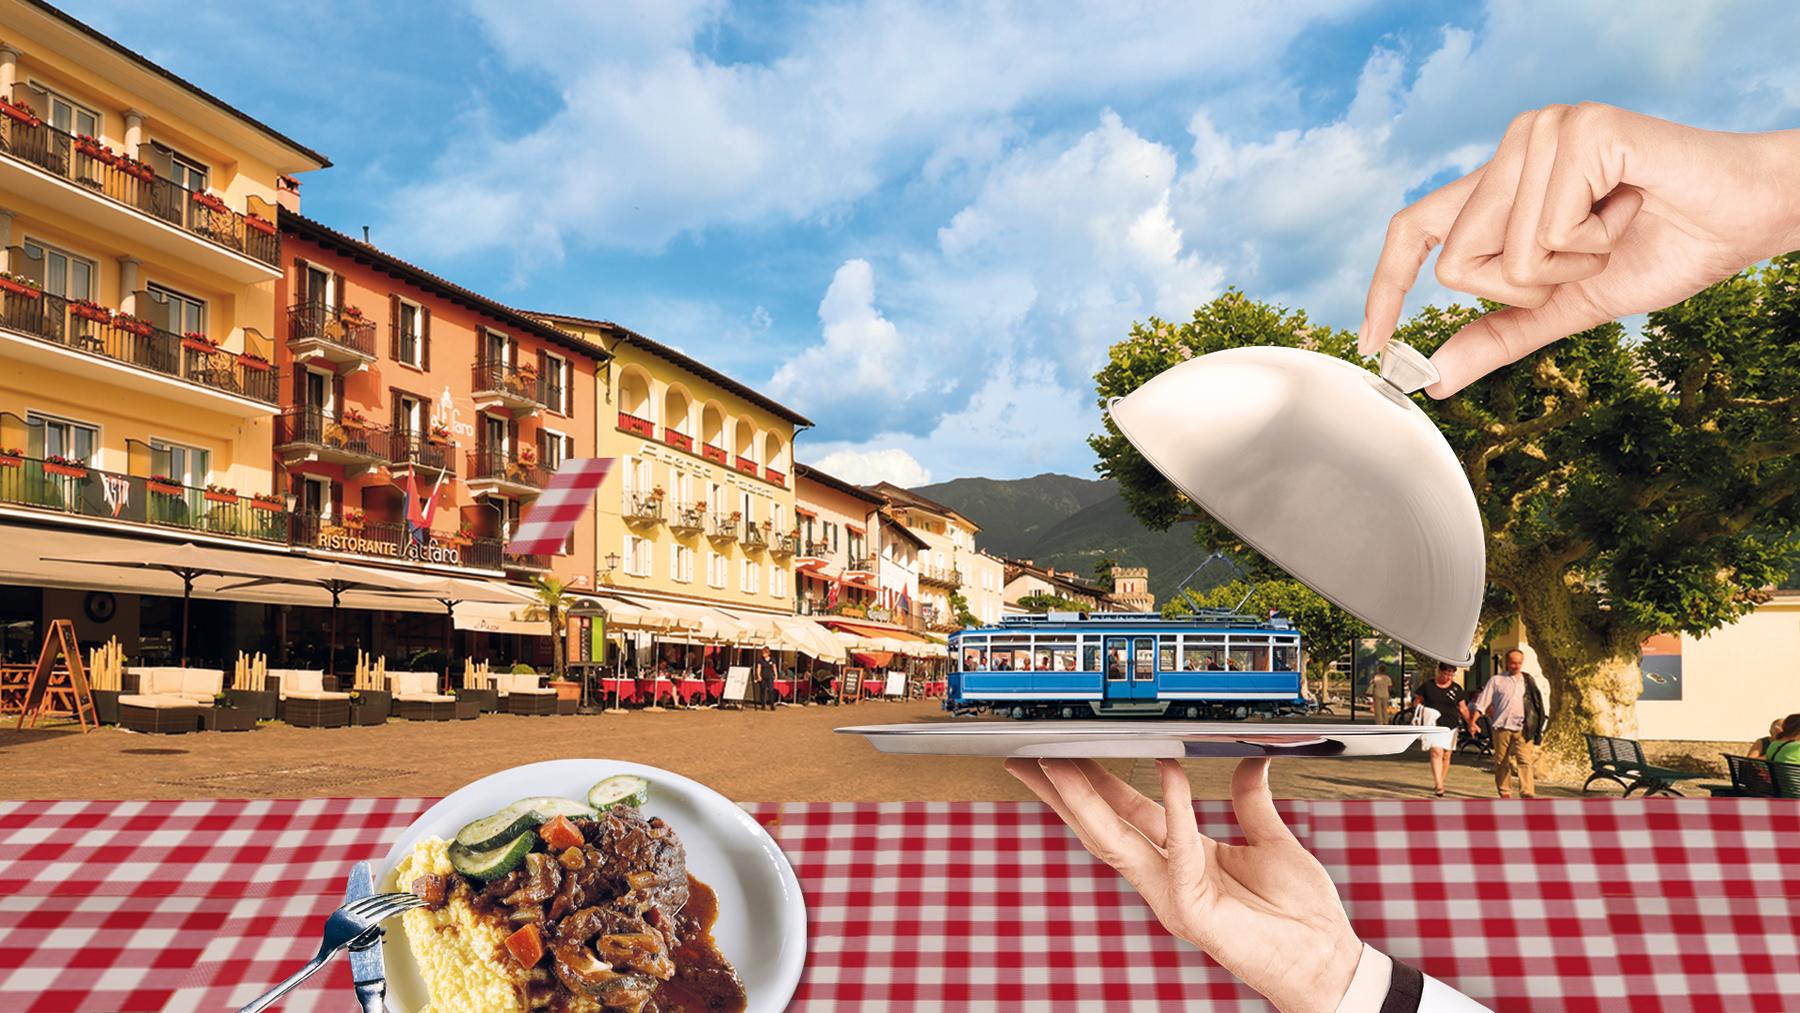 Titelbild Ticino Tram